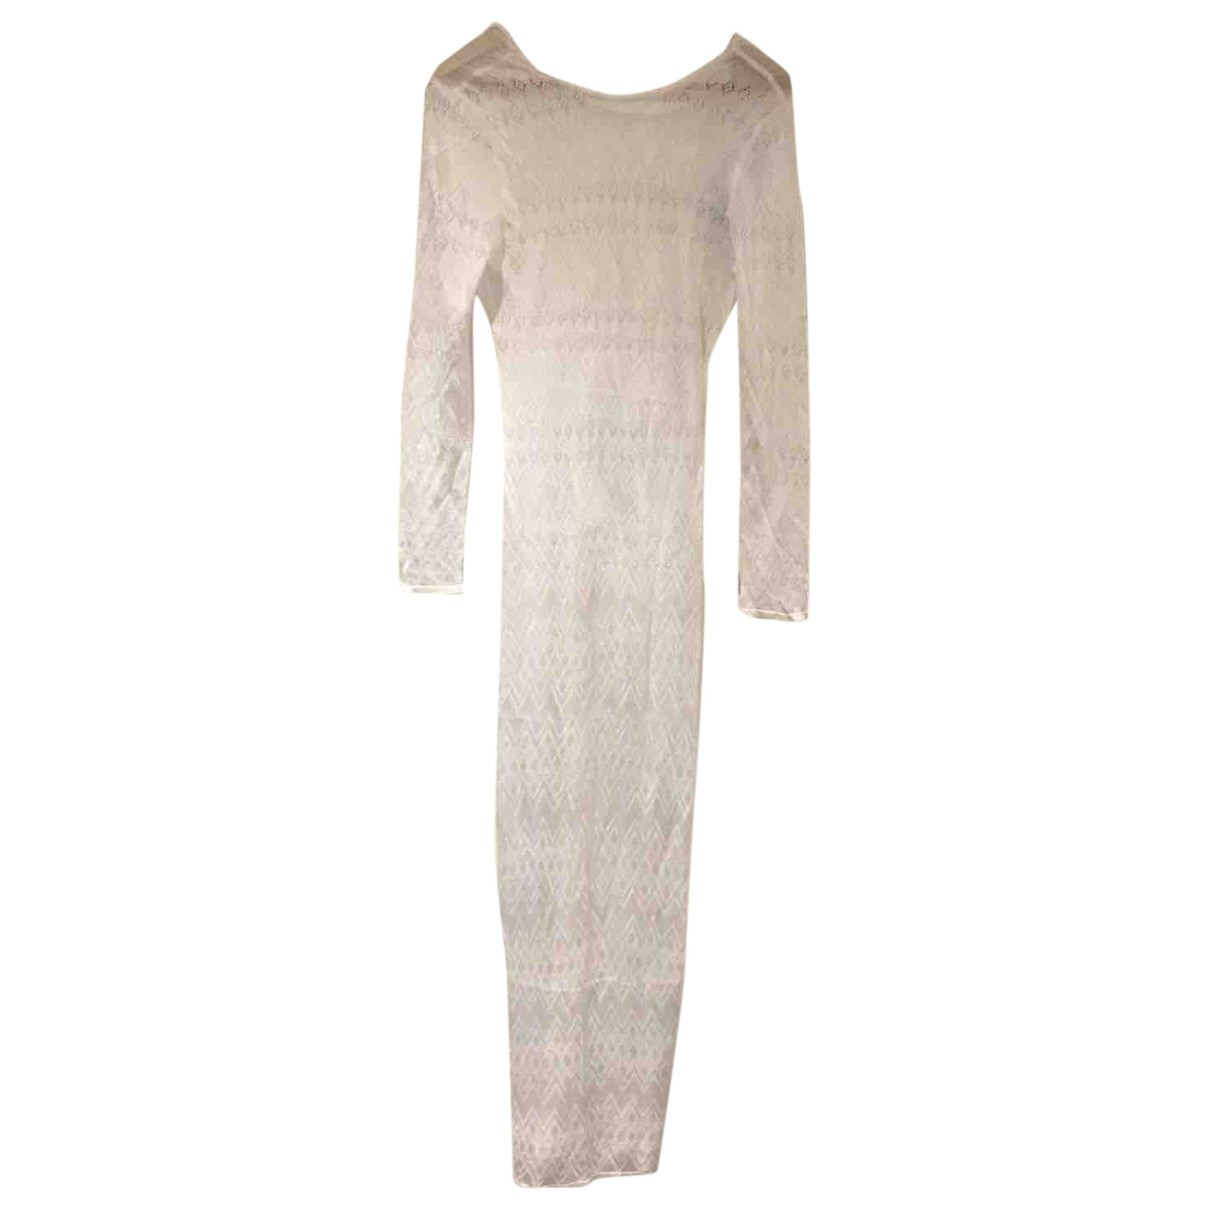 Melissa Odabash \N White Cotton dress for Women 10 UK